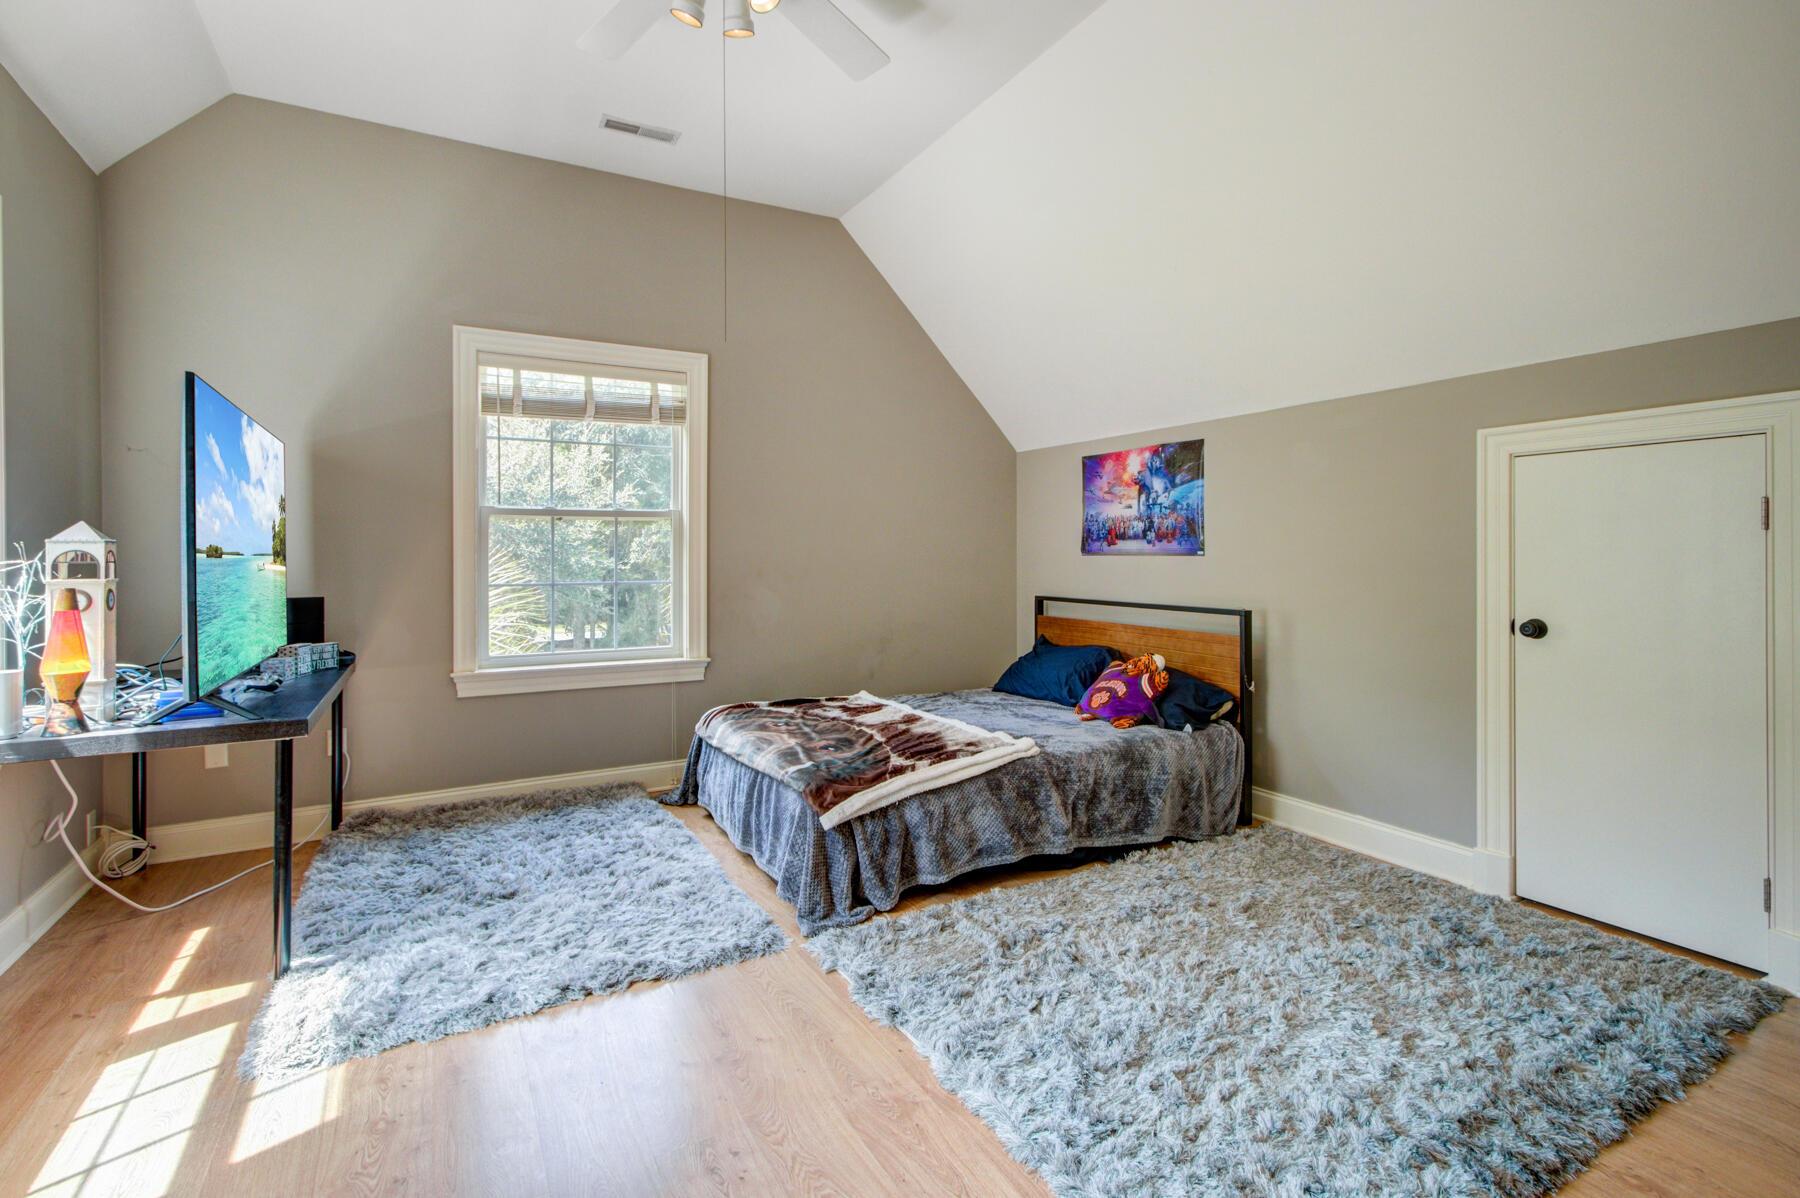 Dunes West Homes For Sale - 3095 Pignatelli, Mount Pleasant, SC - 55